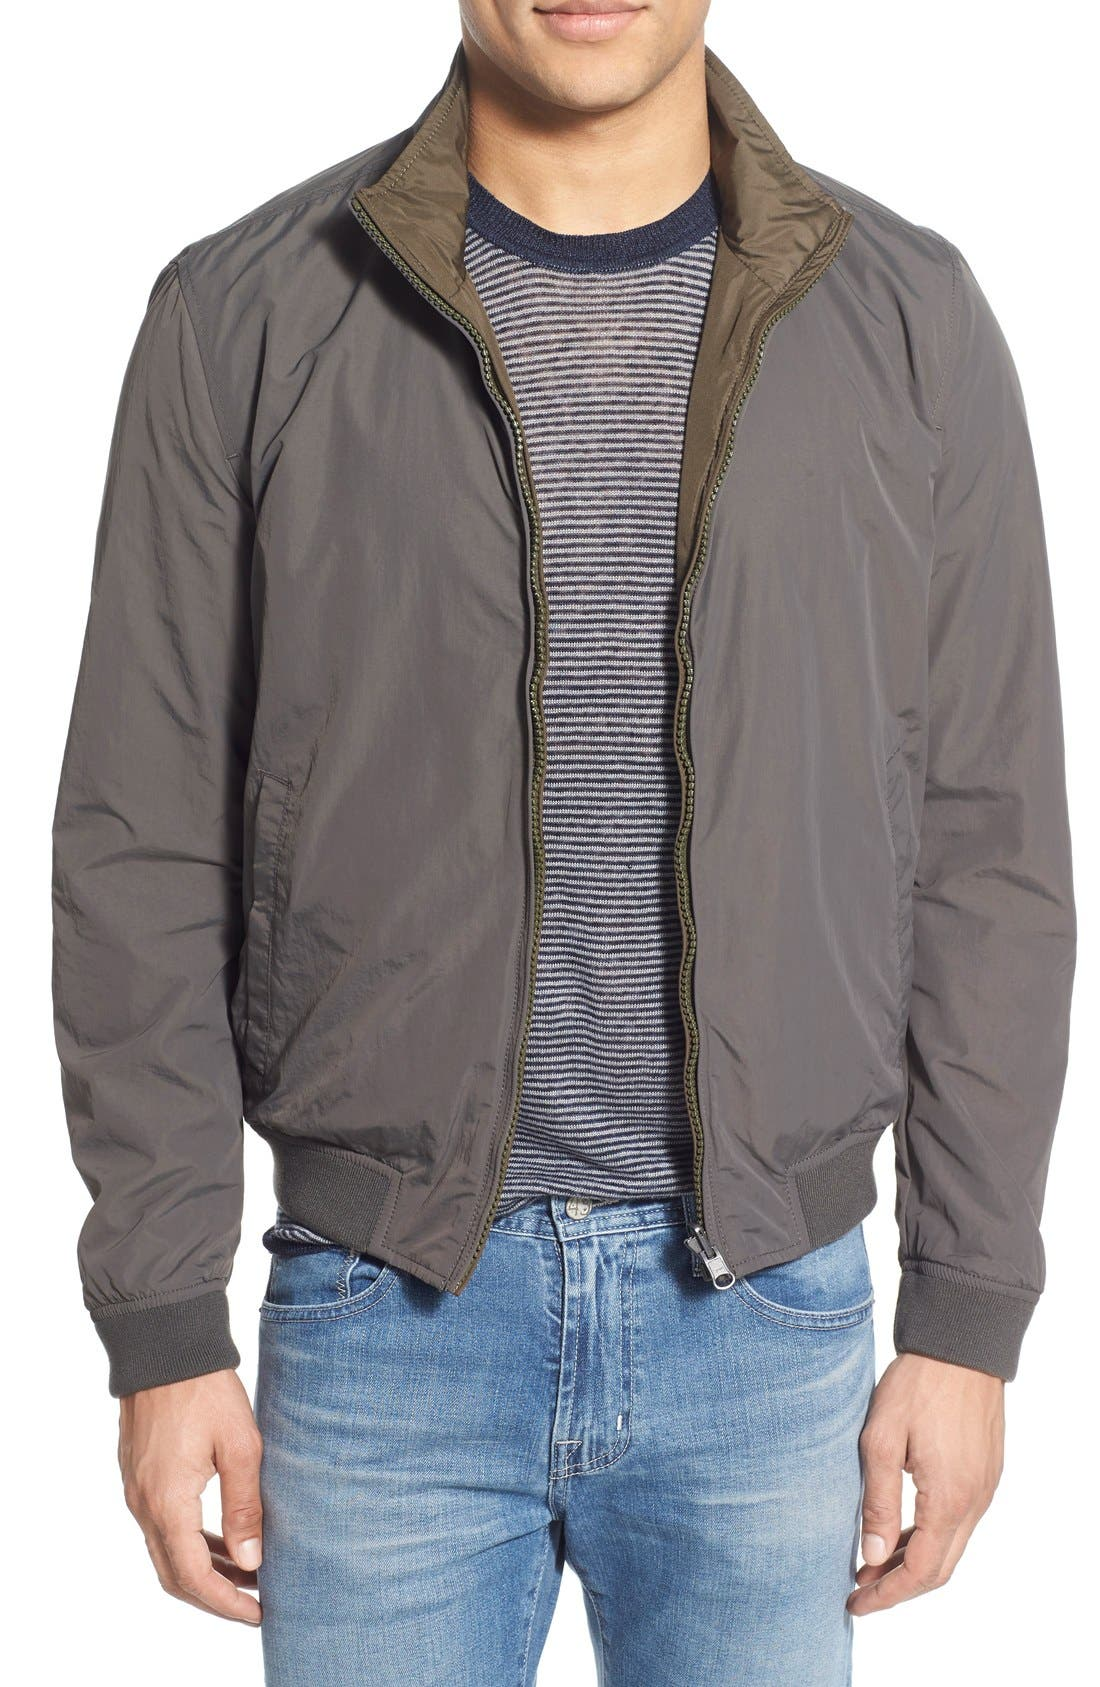 John Rich Reversible Jacket,                             Alternate thumbnail 3, color,                             308